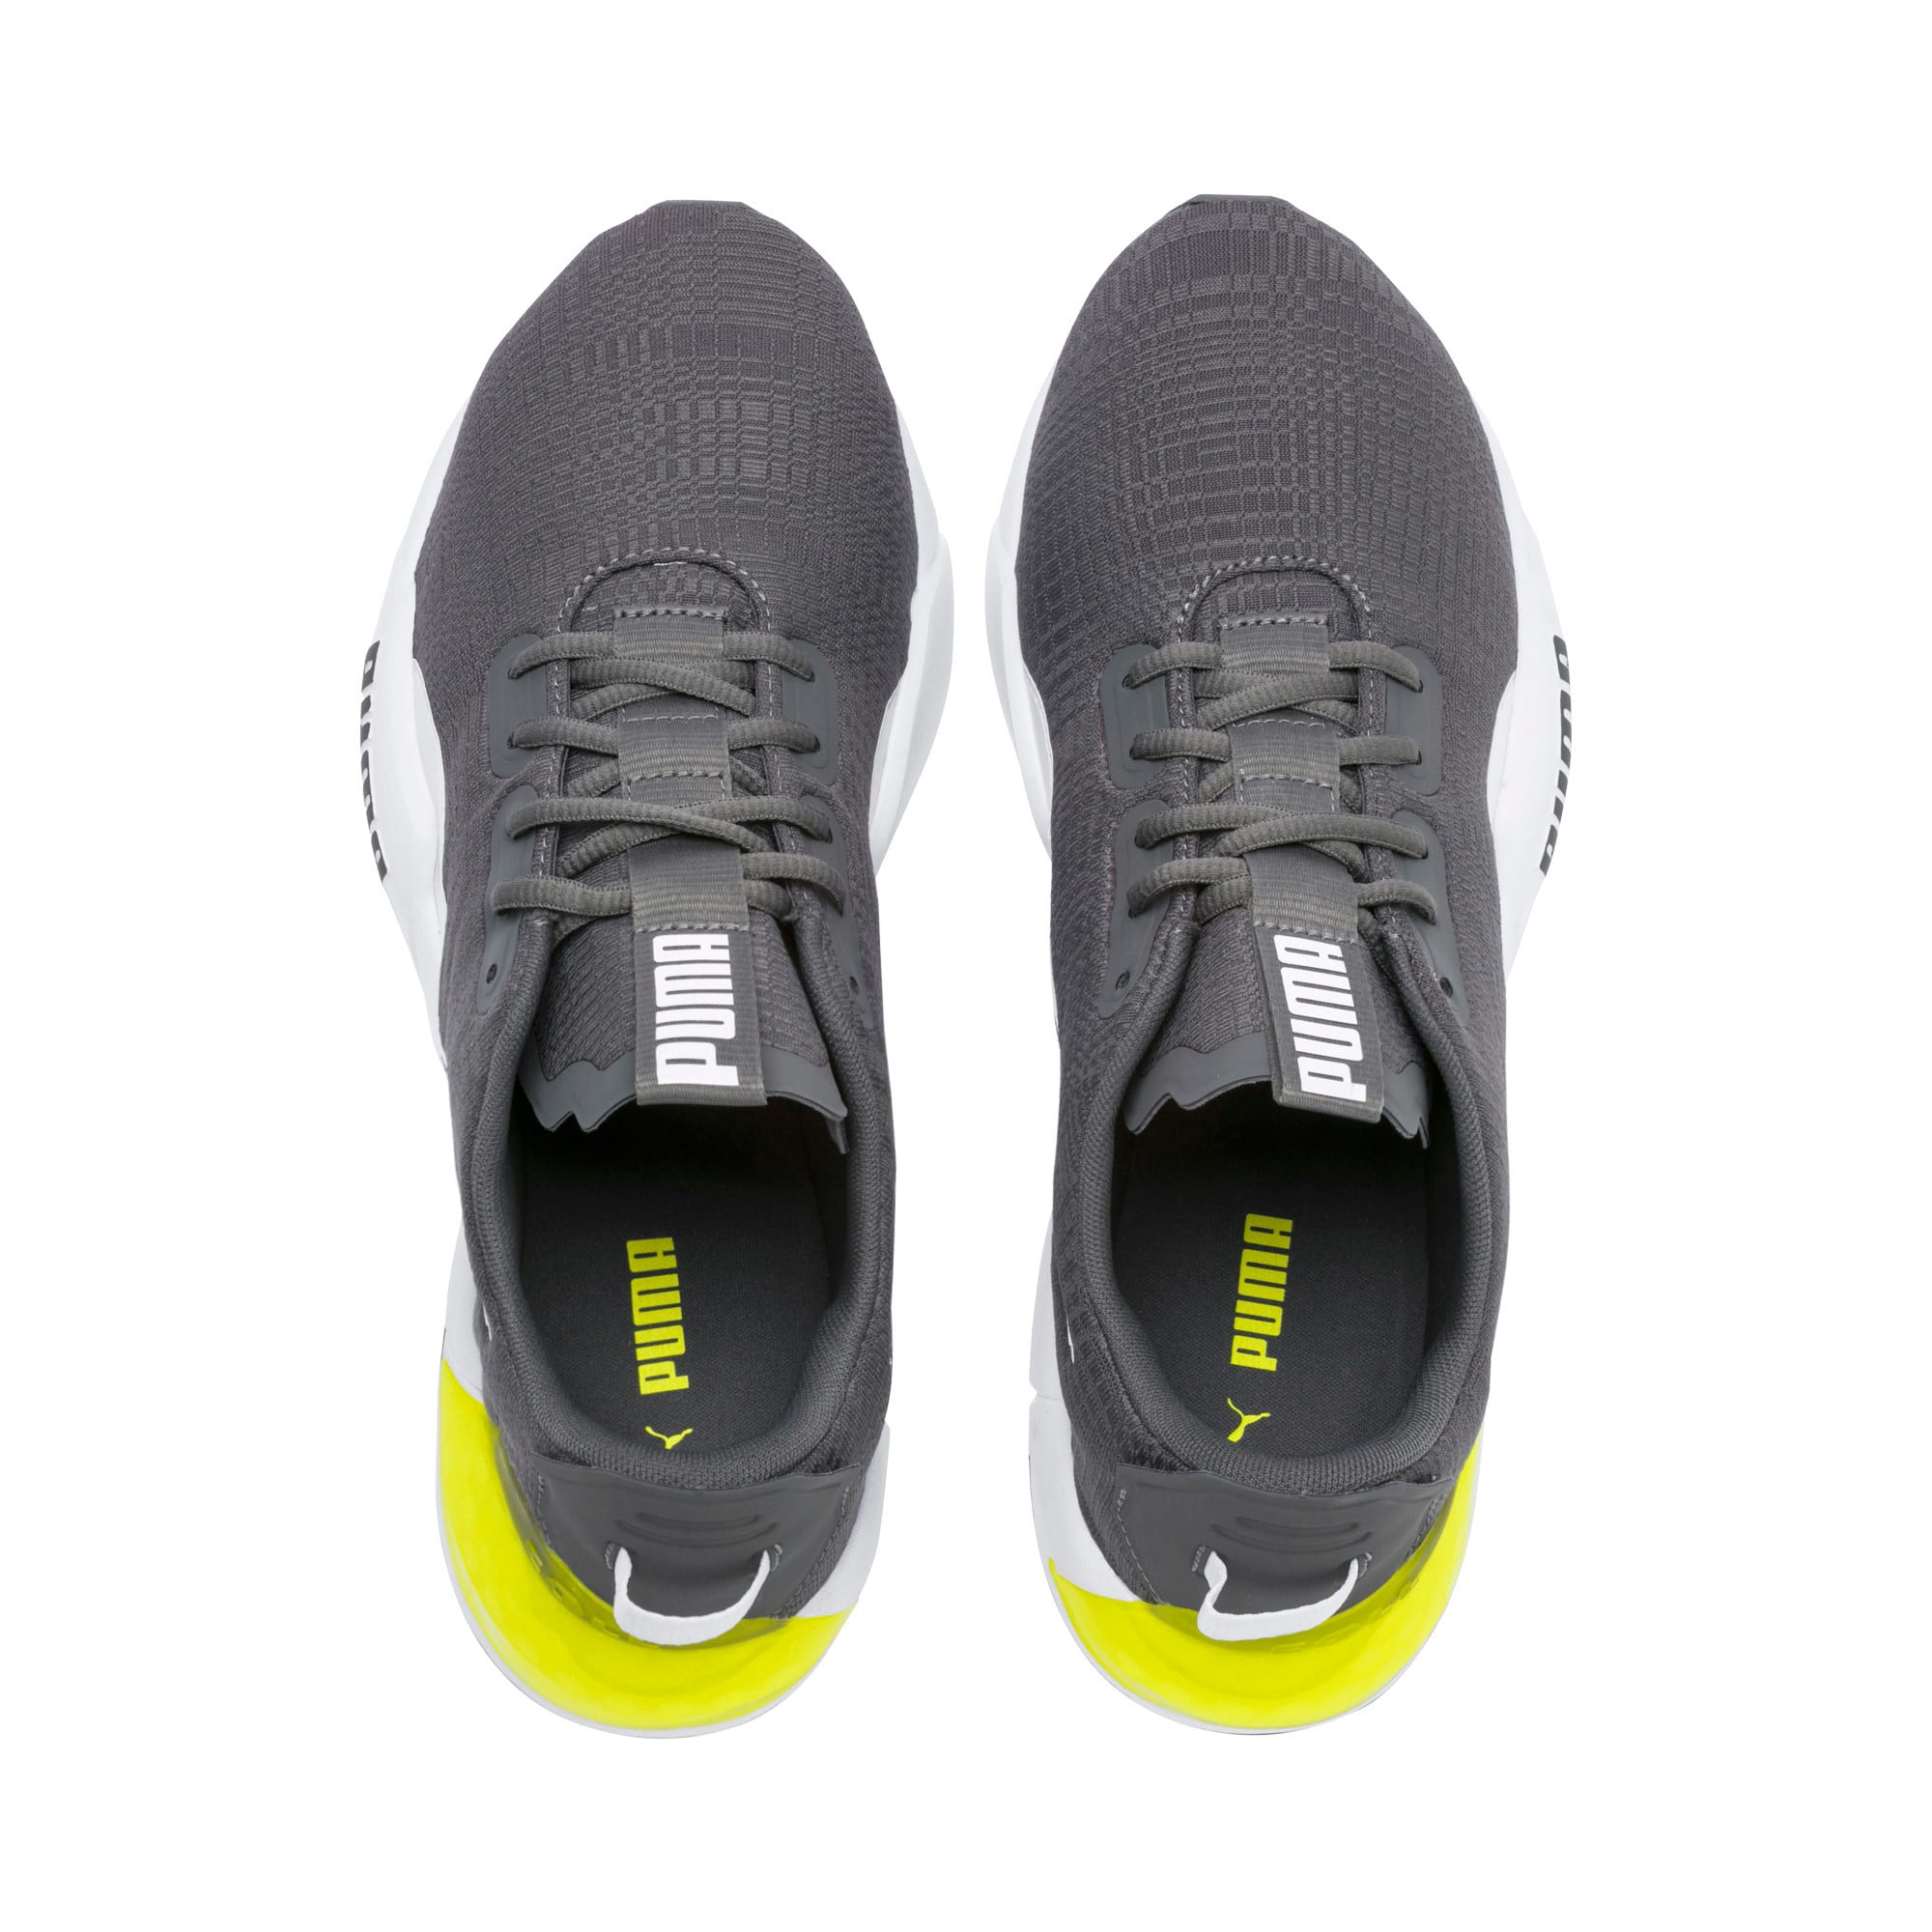 Thumbnail 7 of CELL Phase Lights Men's Training Shoes, CASTLEROCK-Yellow Alert, medium